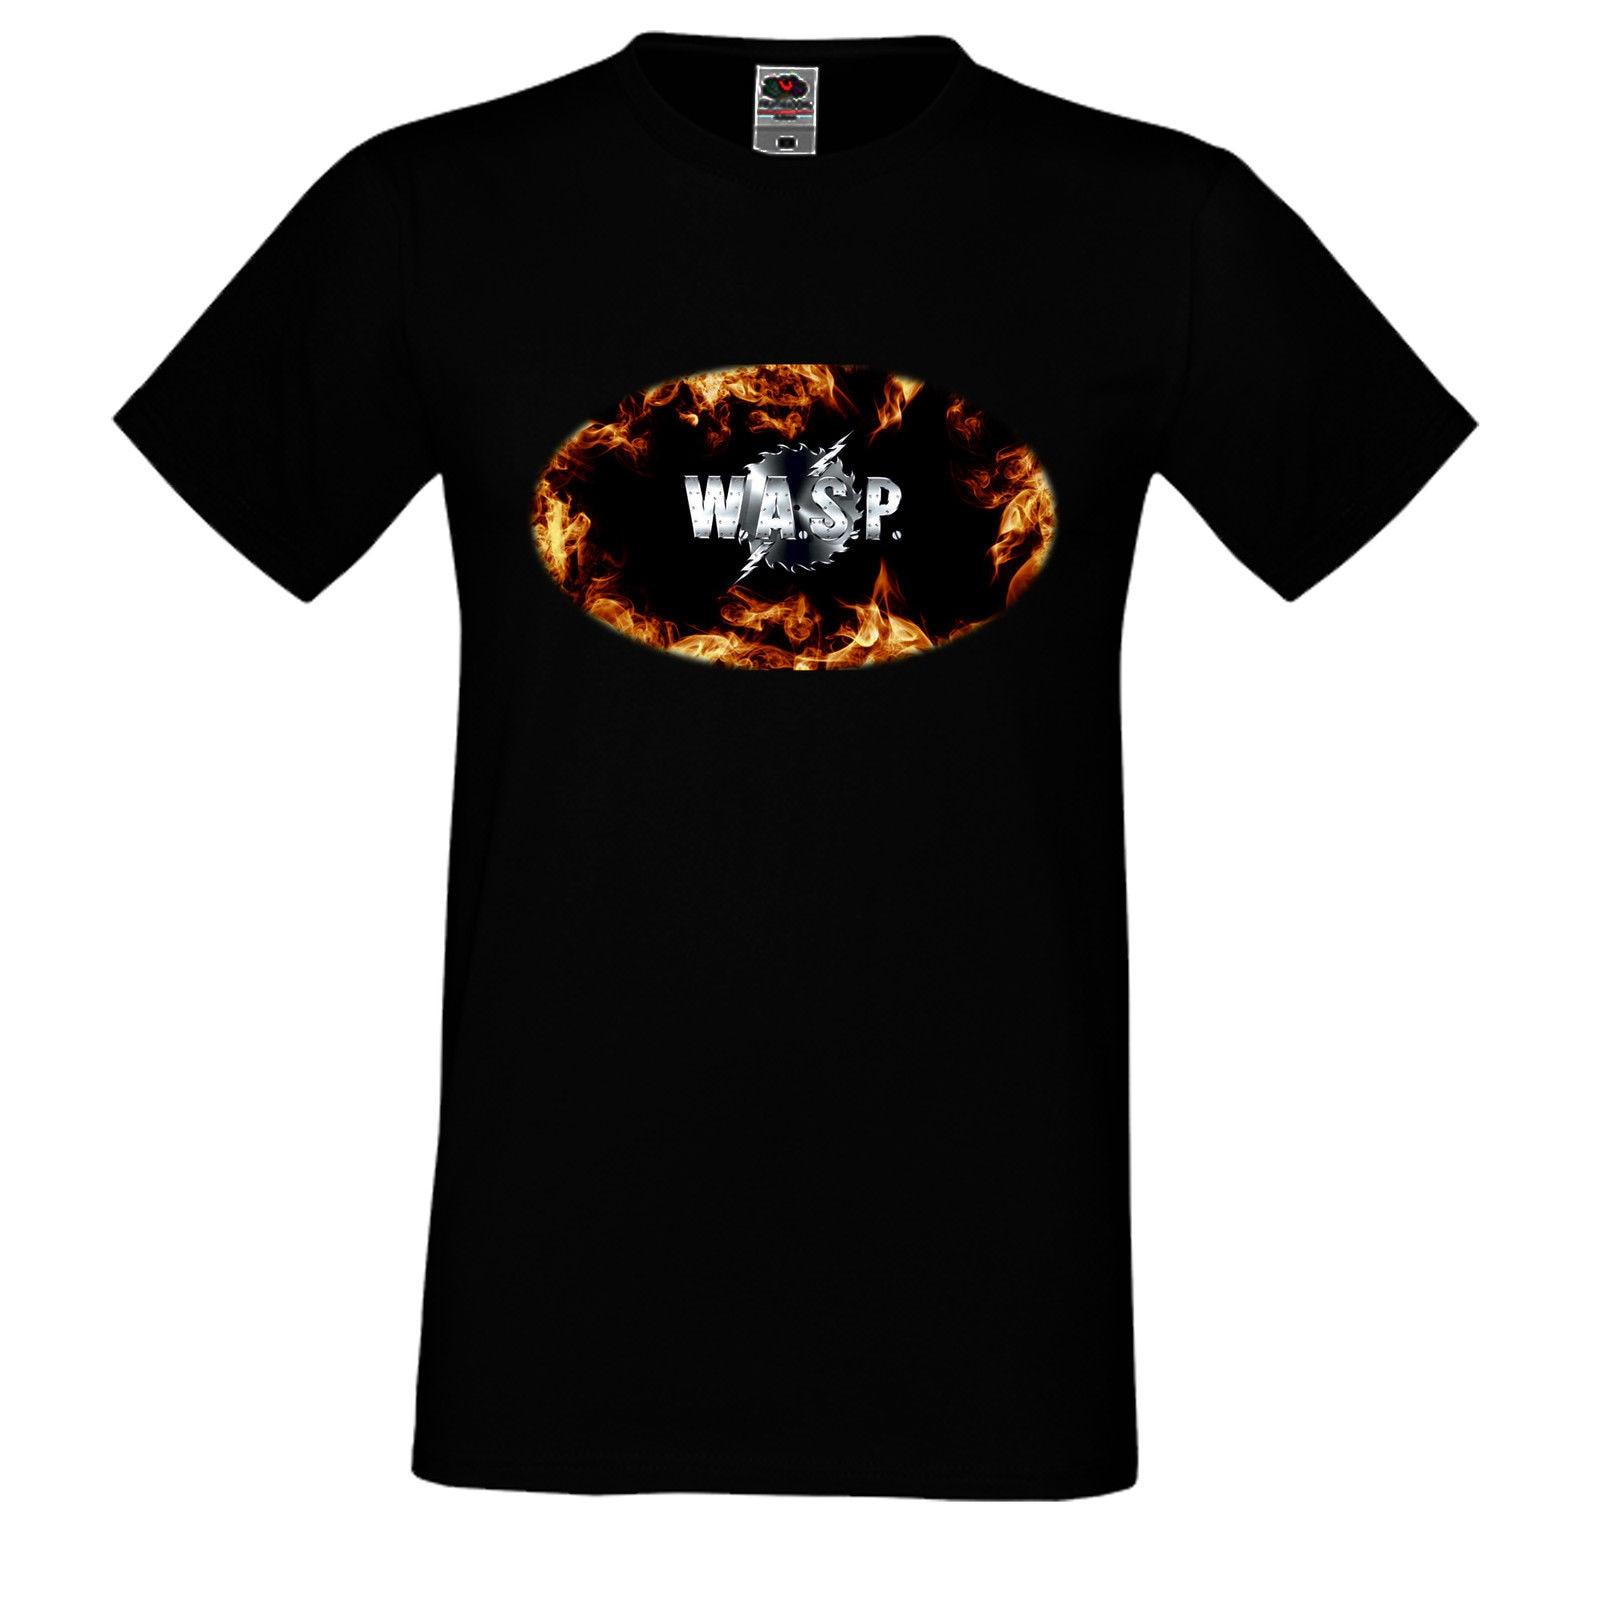 HERREN/MEN T-SHIRT W.A.S.P. WASP 2 FIRE HEAVY METAL LANGARM/KURZARM